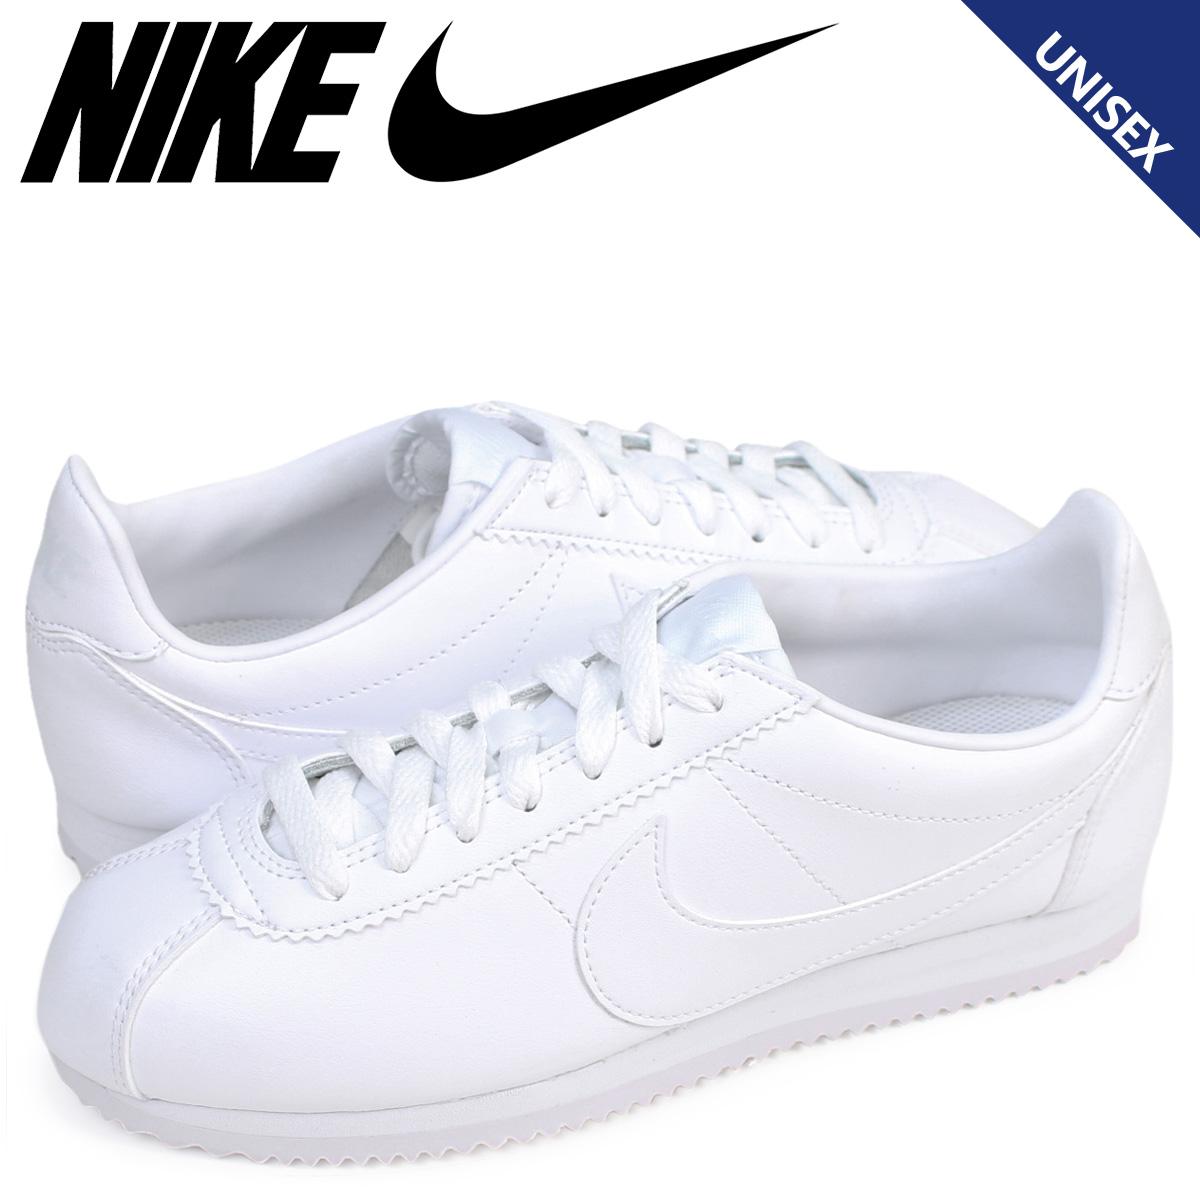 info for ae1b1 db84a Whats up Sports  Nike NIKE コルテッツクラシックレザーレディーススニーカー WMNS CLASSIC CORTEZ  LEATHER 807,471-102 shoes white  7 29 Shinnyu load    Rakuten ...